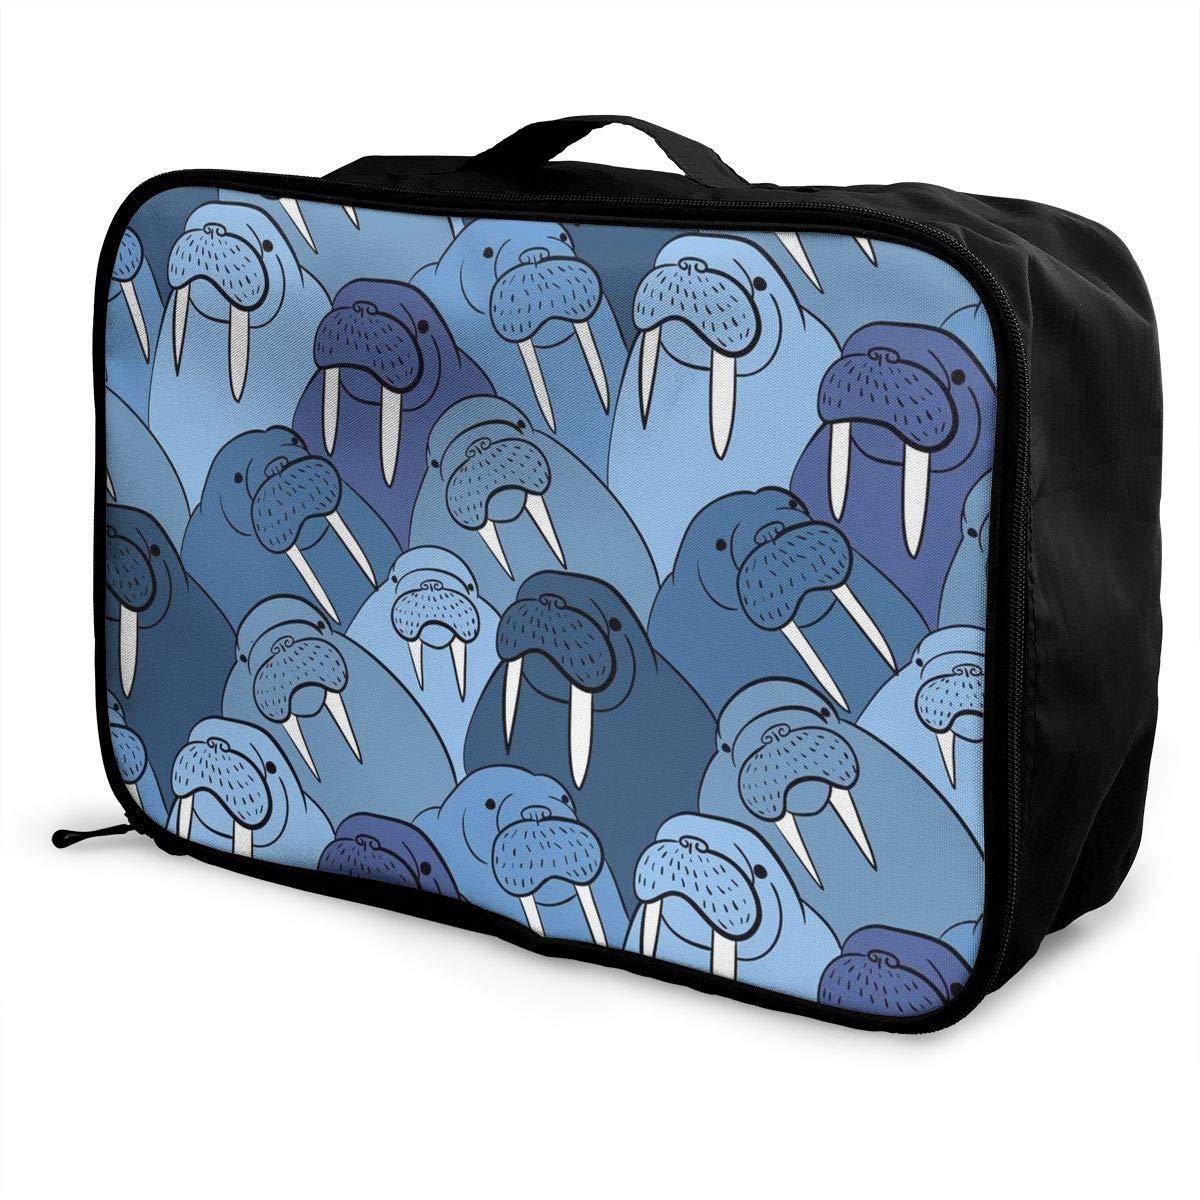 Travel Lightweight Waterproof Foldable Storage Carry Luggage Duffle Tote Bag Walrus Cute Animal Art Nautical Ocean Theme Antarctic JTRVW Luggage Bags for Travel